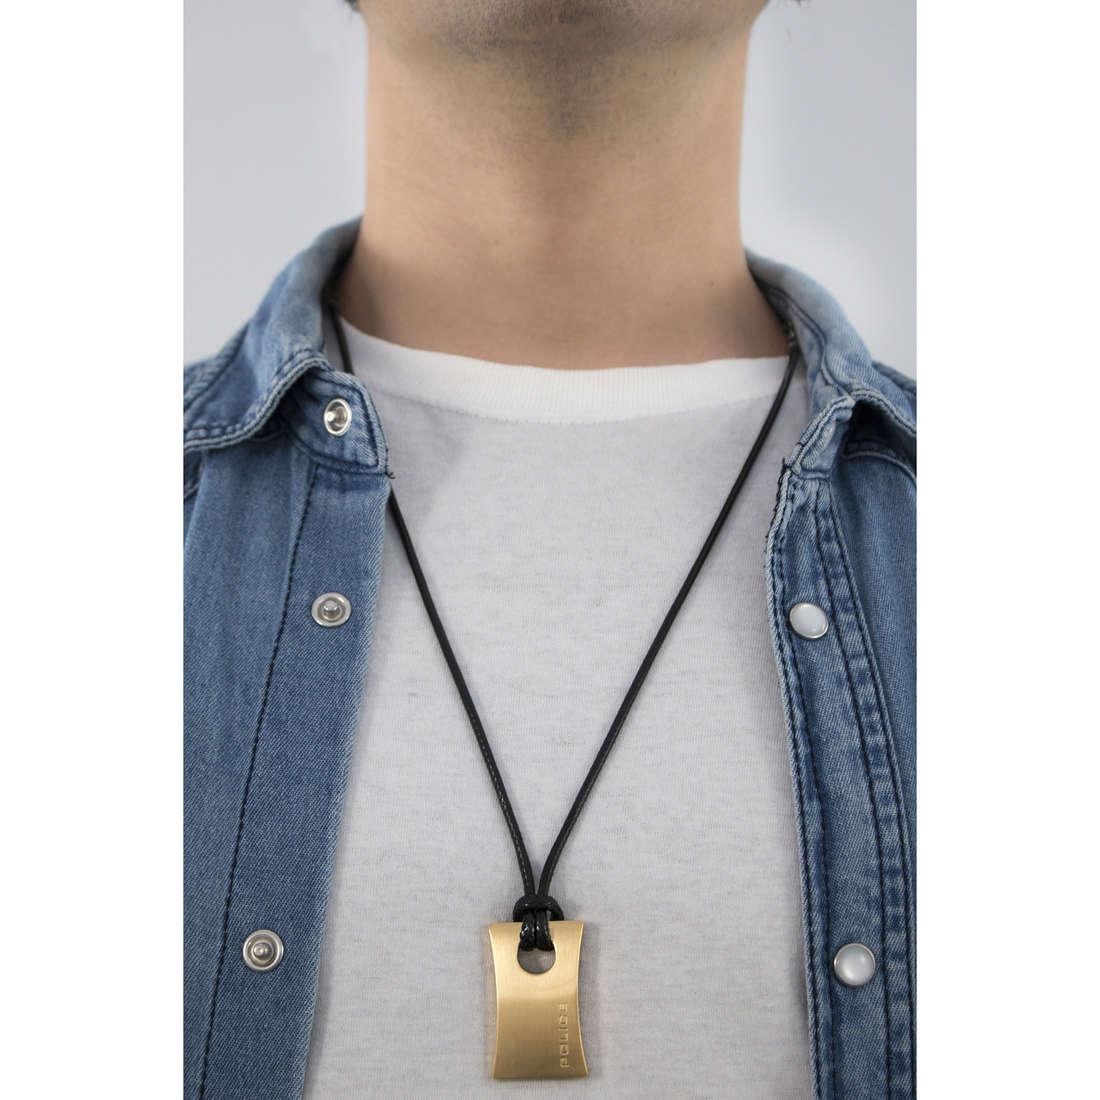 Police necklaces Carver man S14AGN02P indosso